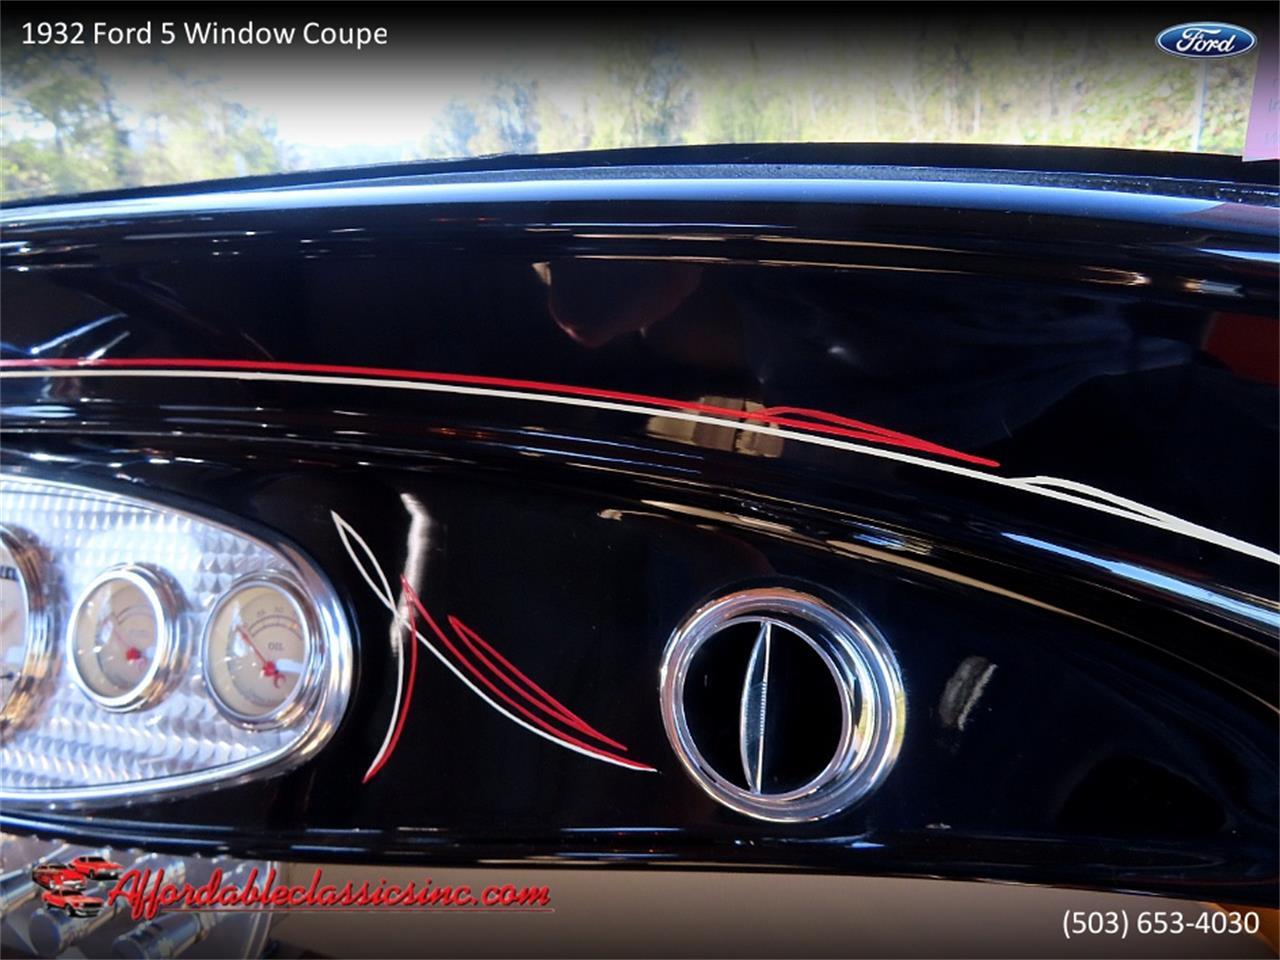 1932 Ford 5-Window Coupe (CC-1411937) for sale in Gladstone, Oregon